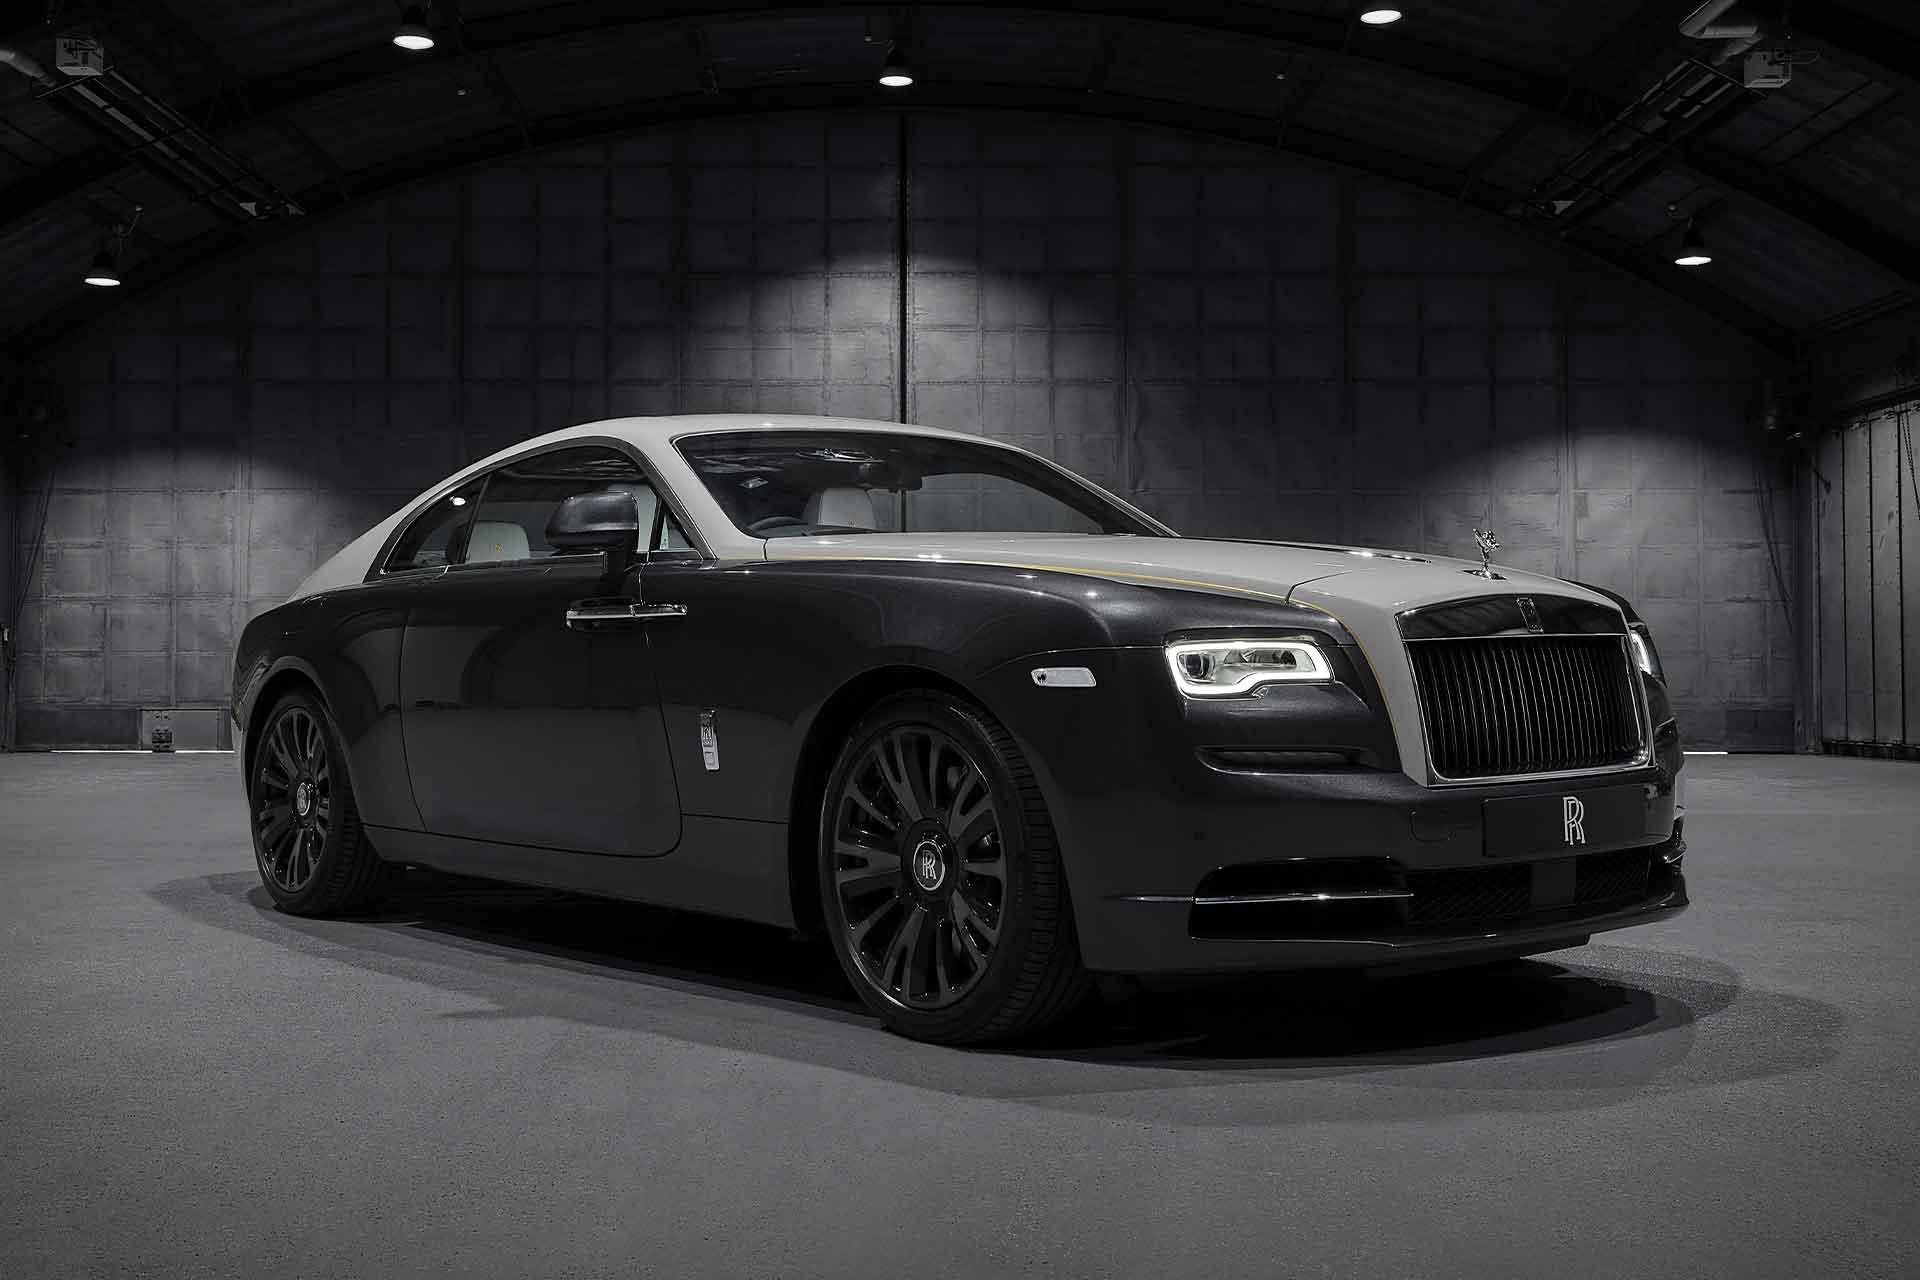 Rolls-Royce Wraith Eagle VIII Coupe